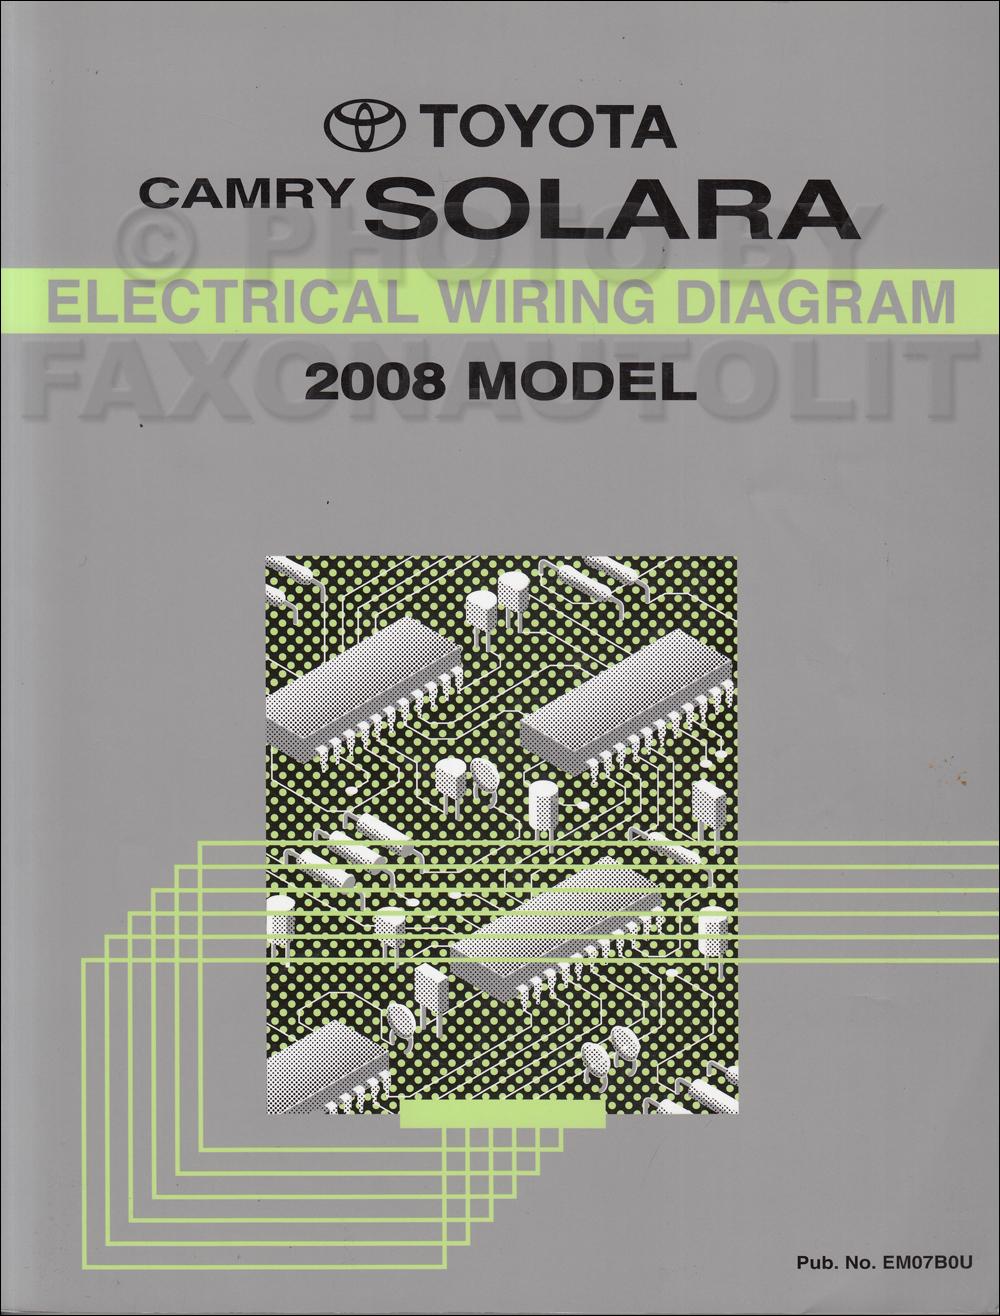 1996 toyota camry radio wiring diagram 1998 honda civic ignition switch pdf 1669 2004 solara manual original 2008